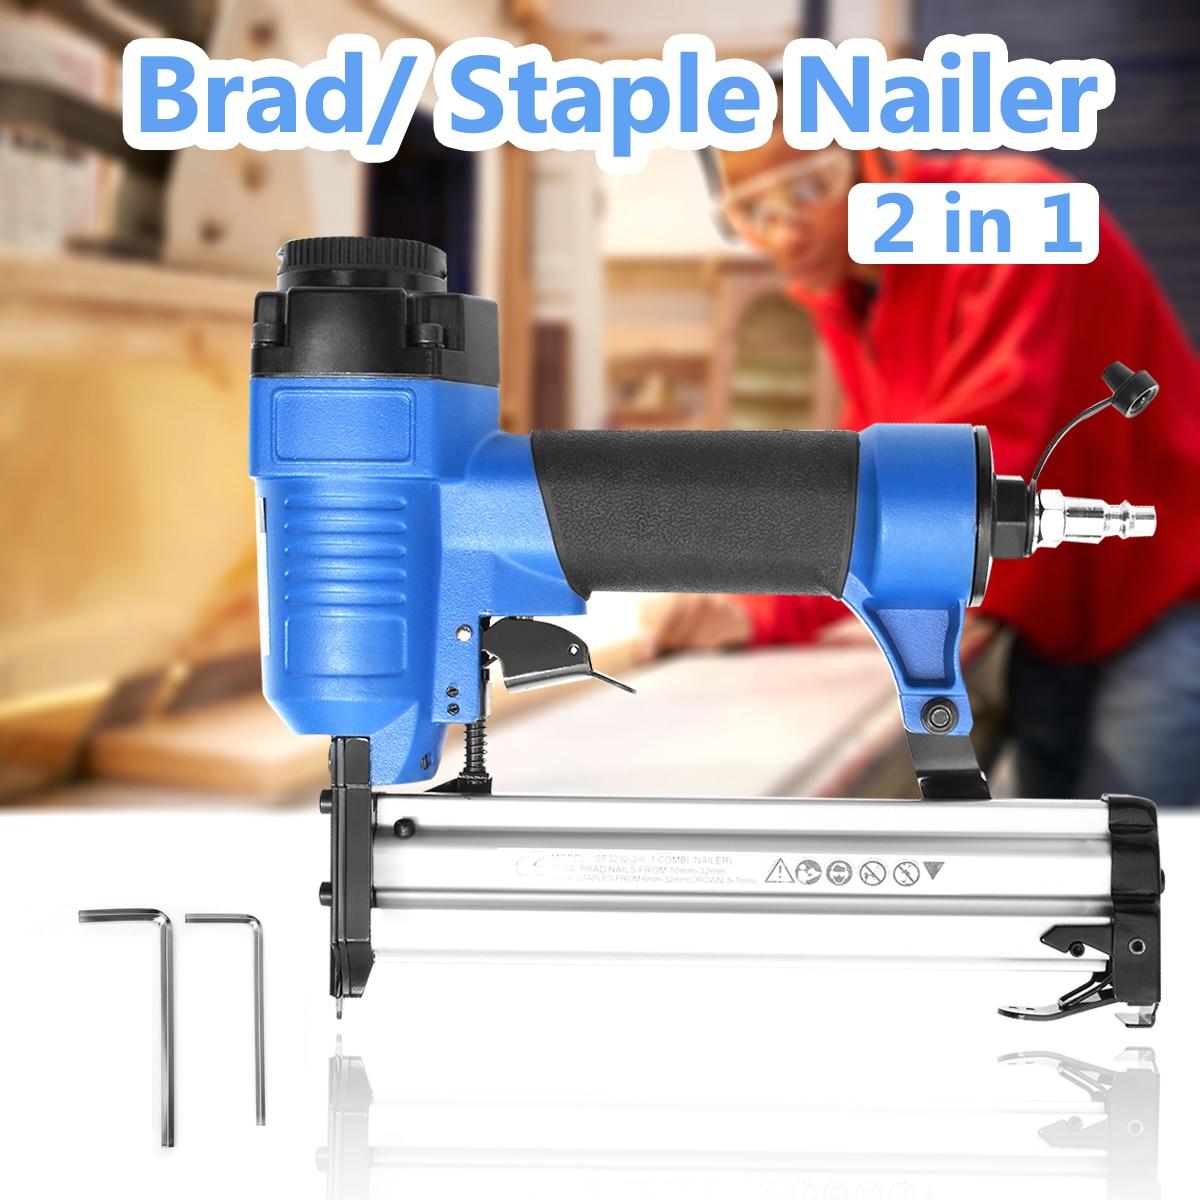 10-32mm 2 in1 Mini Air Staple Nailer Gun Electric Tacker SF3232 Brad Nail Gun Furniture Woodworking Stapler Air Power Tools